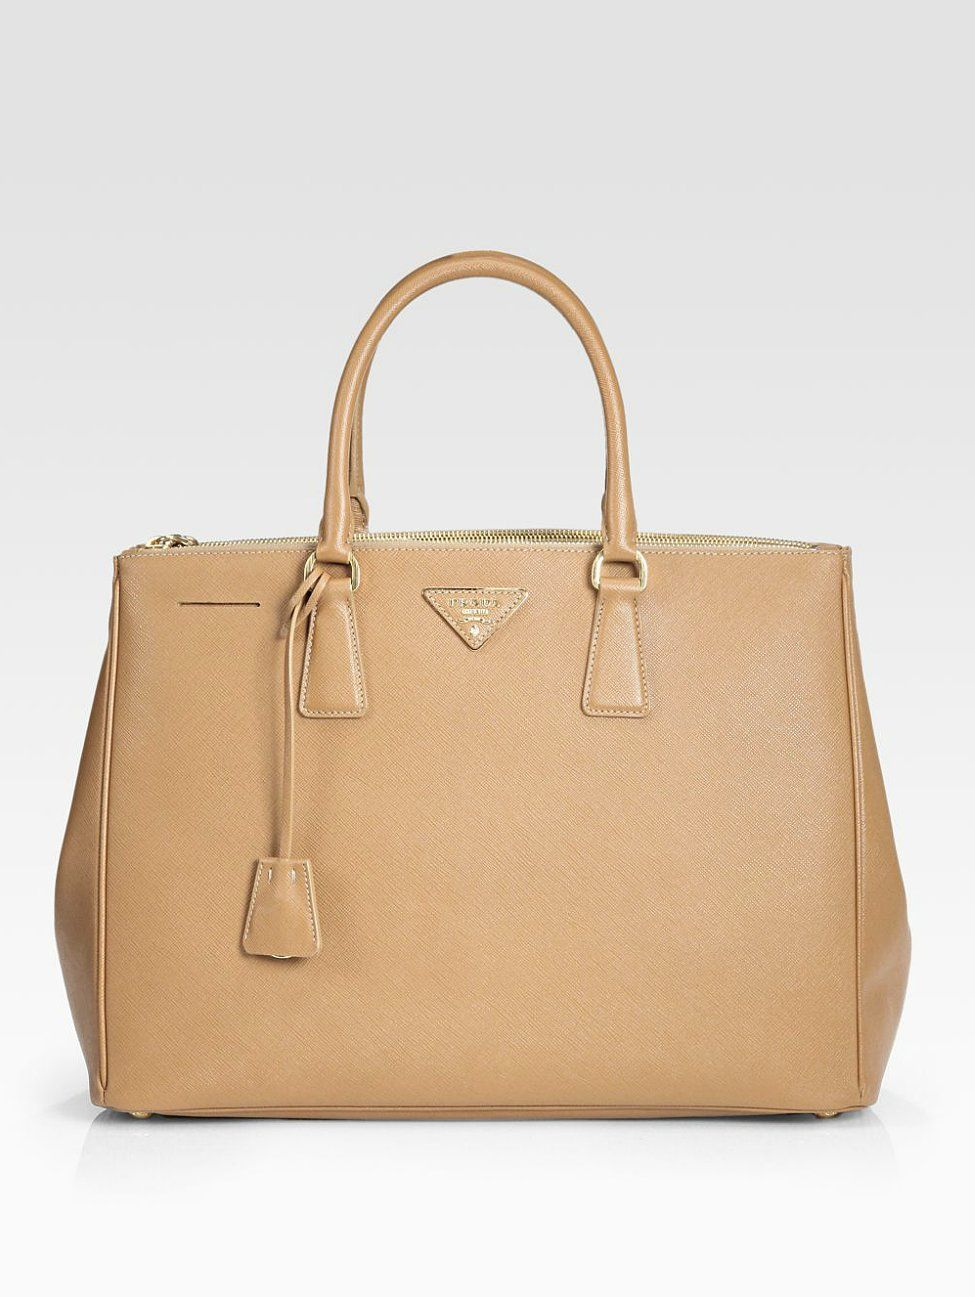 cbdd705047c Aspinal of London Classic Hepburn Bag   Must Haves   Nude bags ...